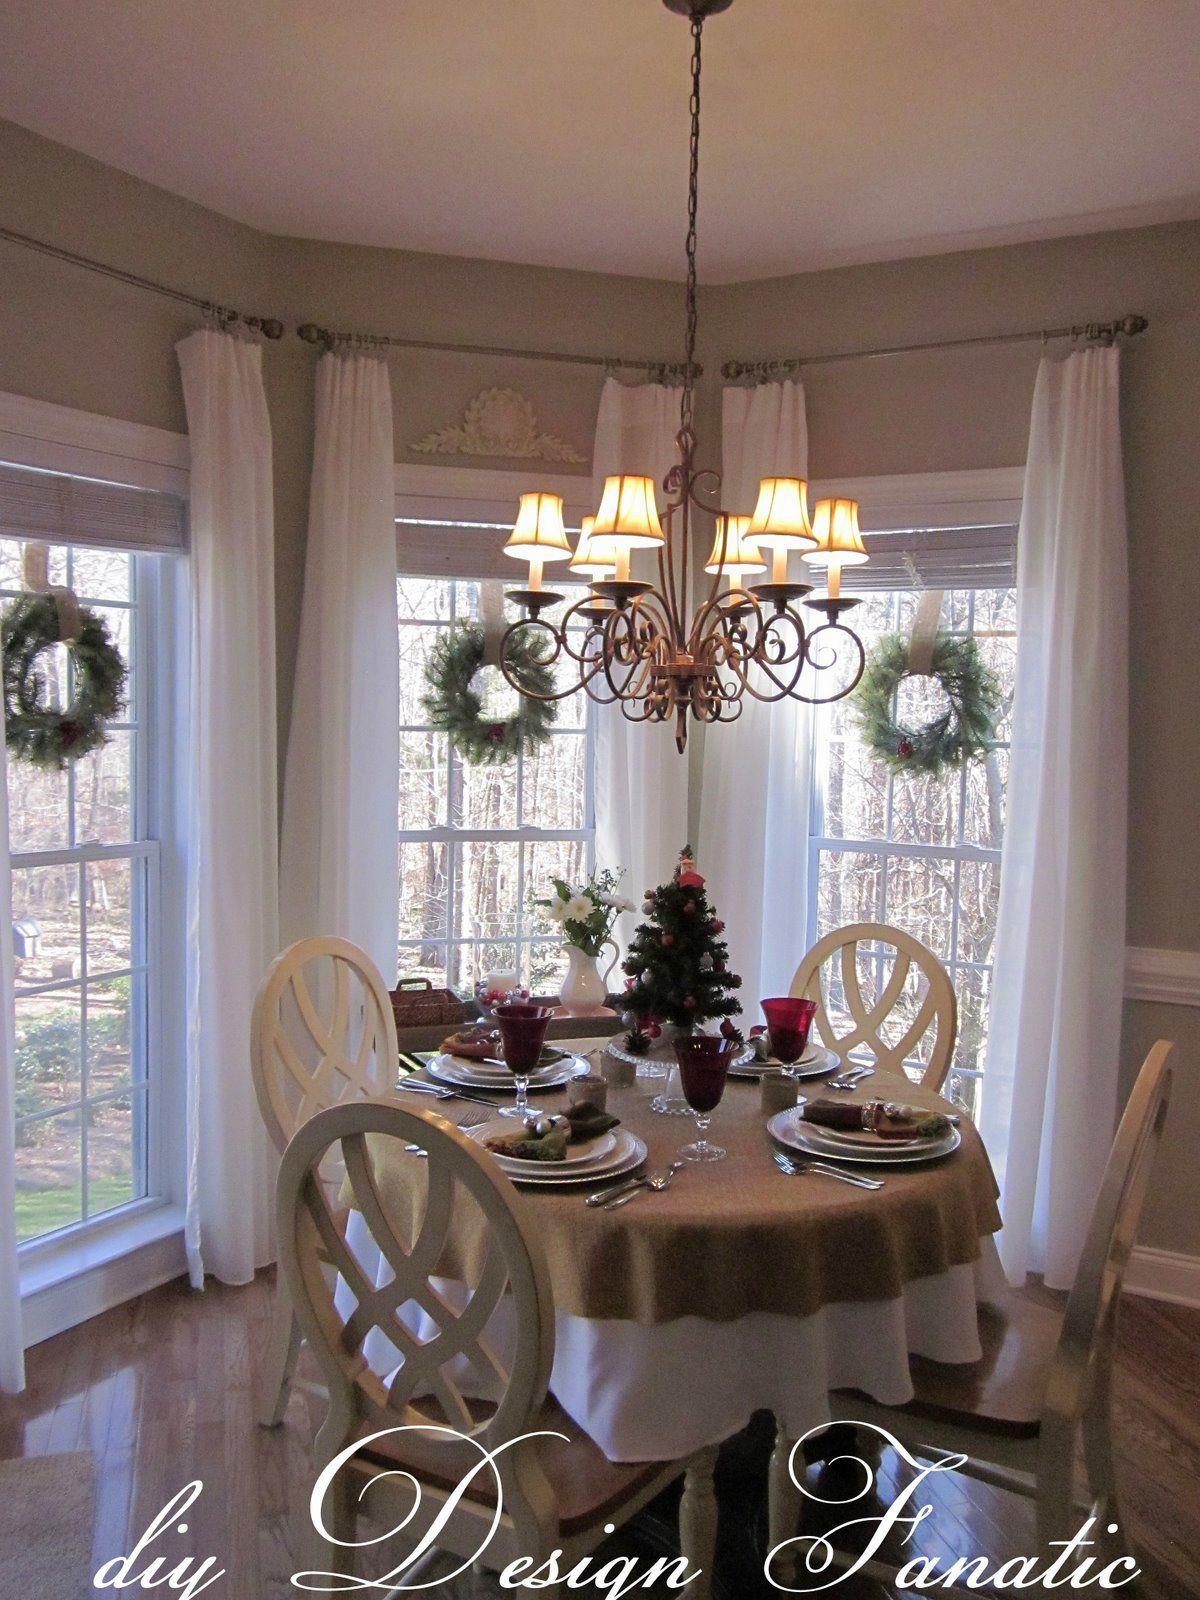 Merry Christmas | Kitchen Ideas | Kitchen curtains, Bay ... on Farmhouse Dining Room Curtain Ideas  id=55264